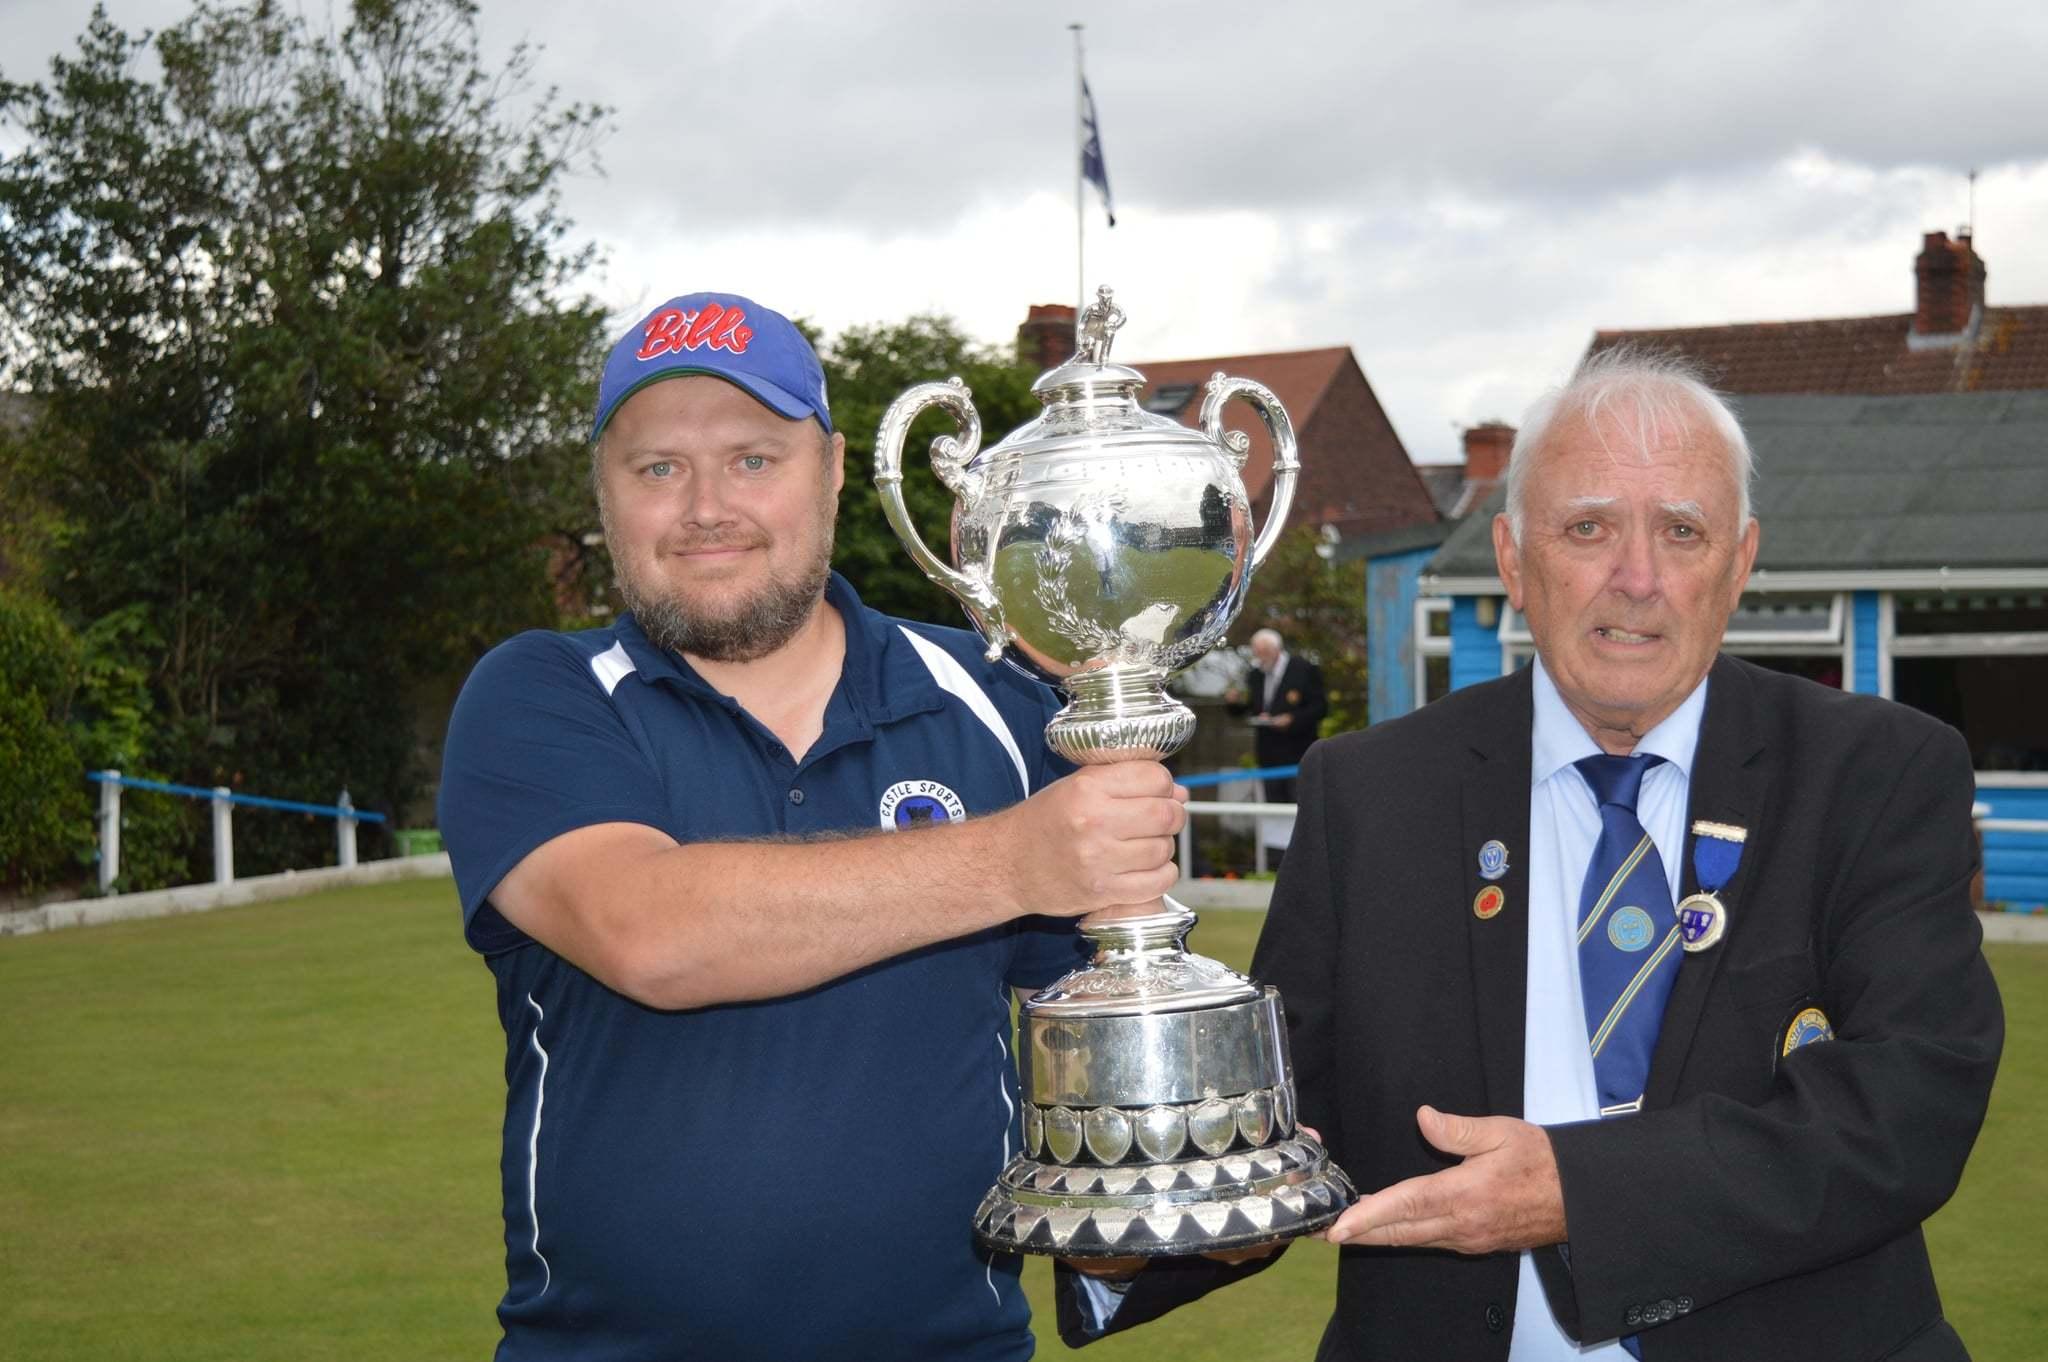 Castle Sports captain Adi Faulkner, left, receives the trophy